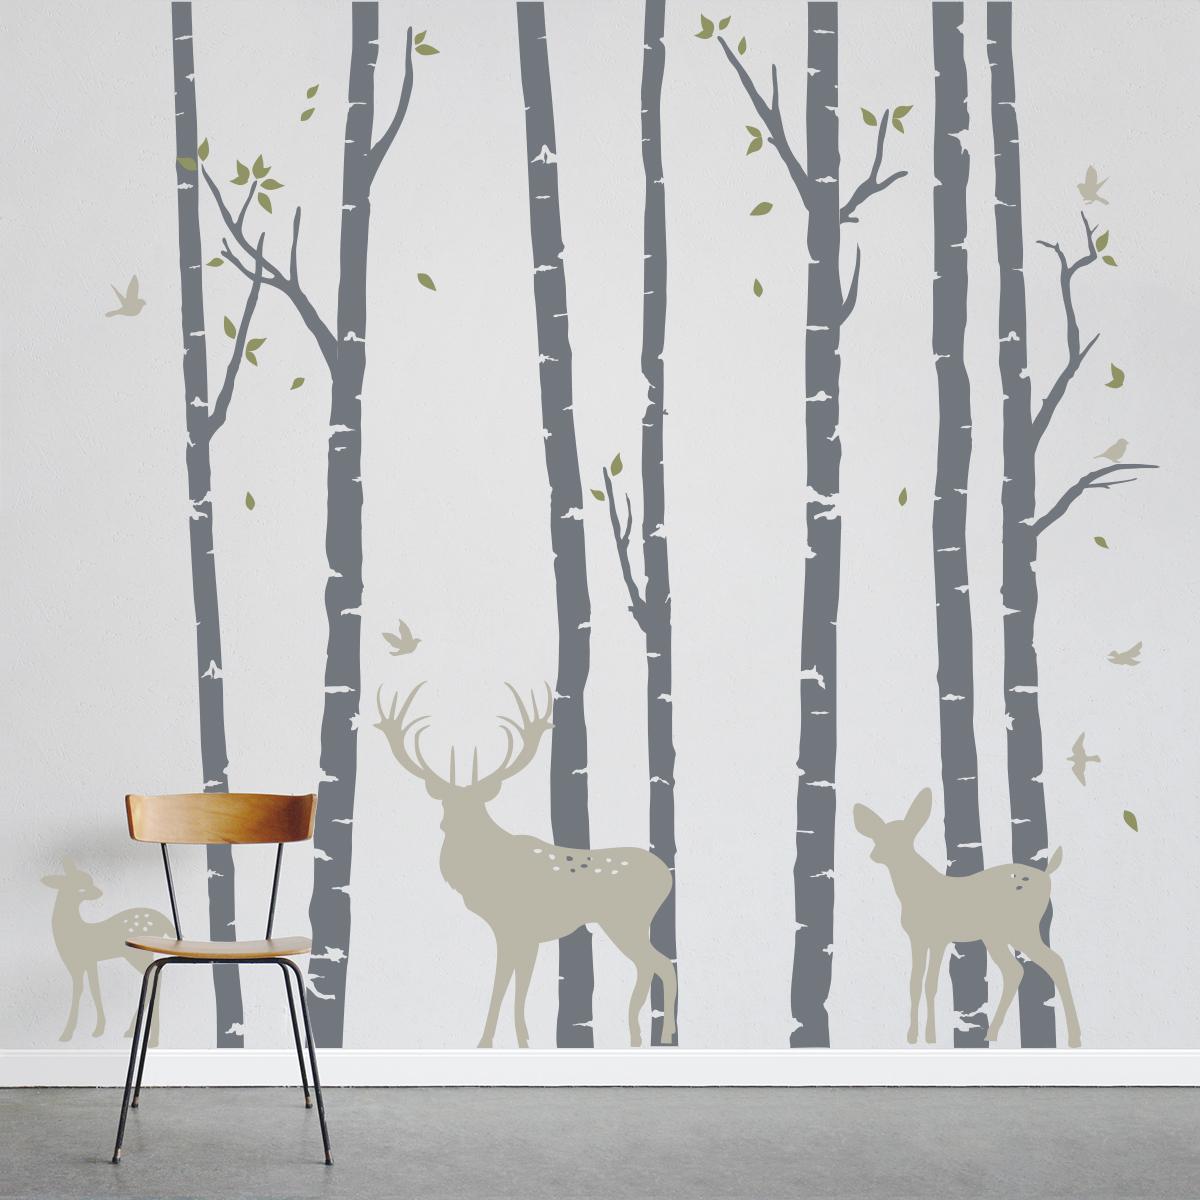 birch tree wall decals 2015   Grasscloth Wallpaper 1200x1200